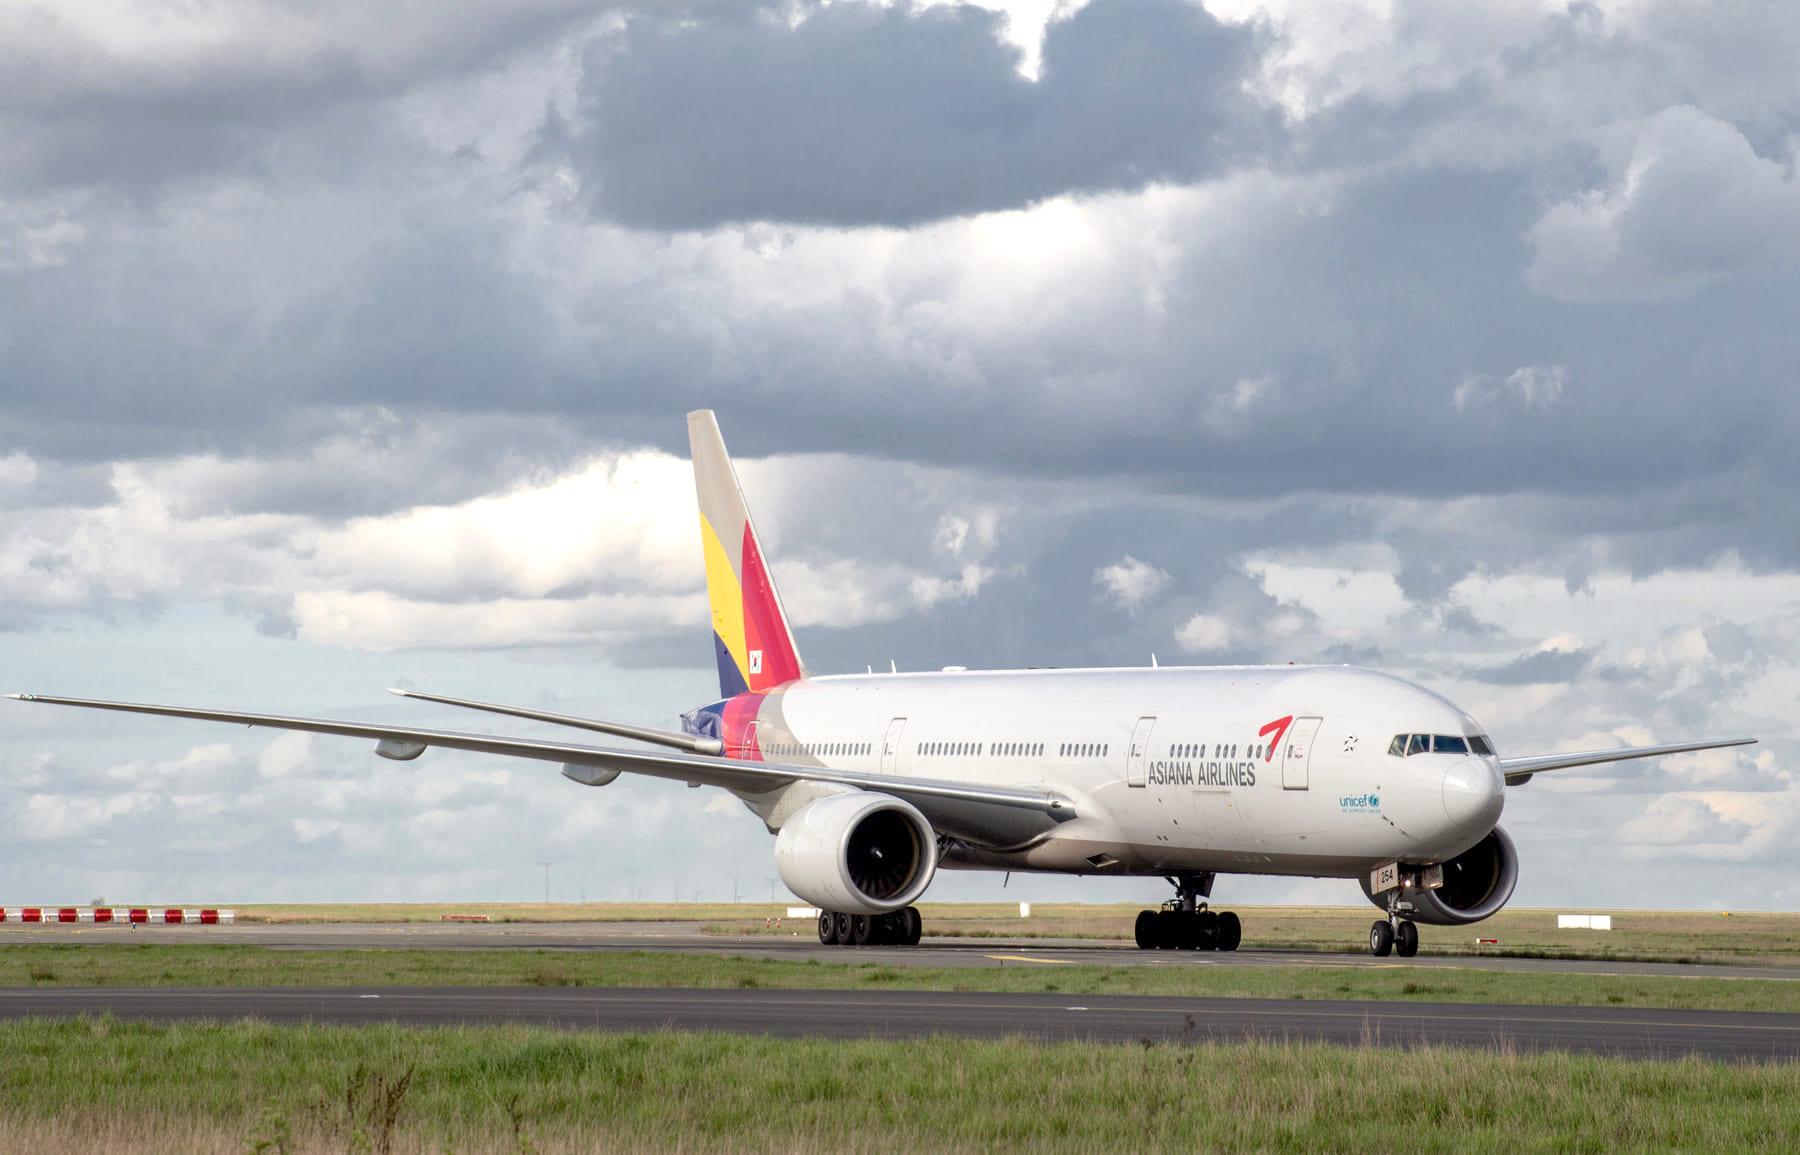 Boeing 777 Asiana